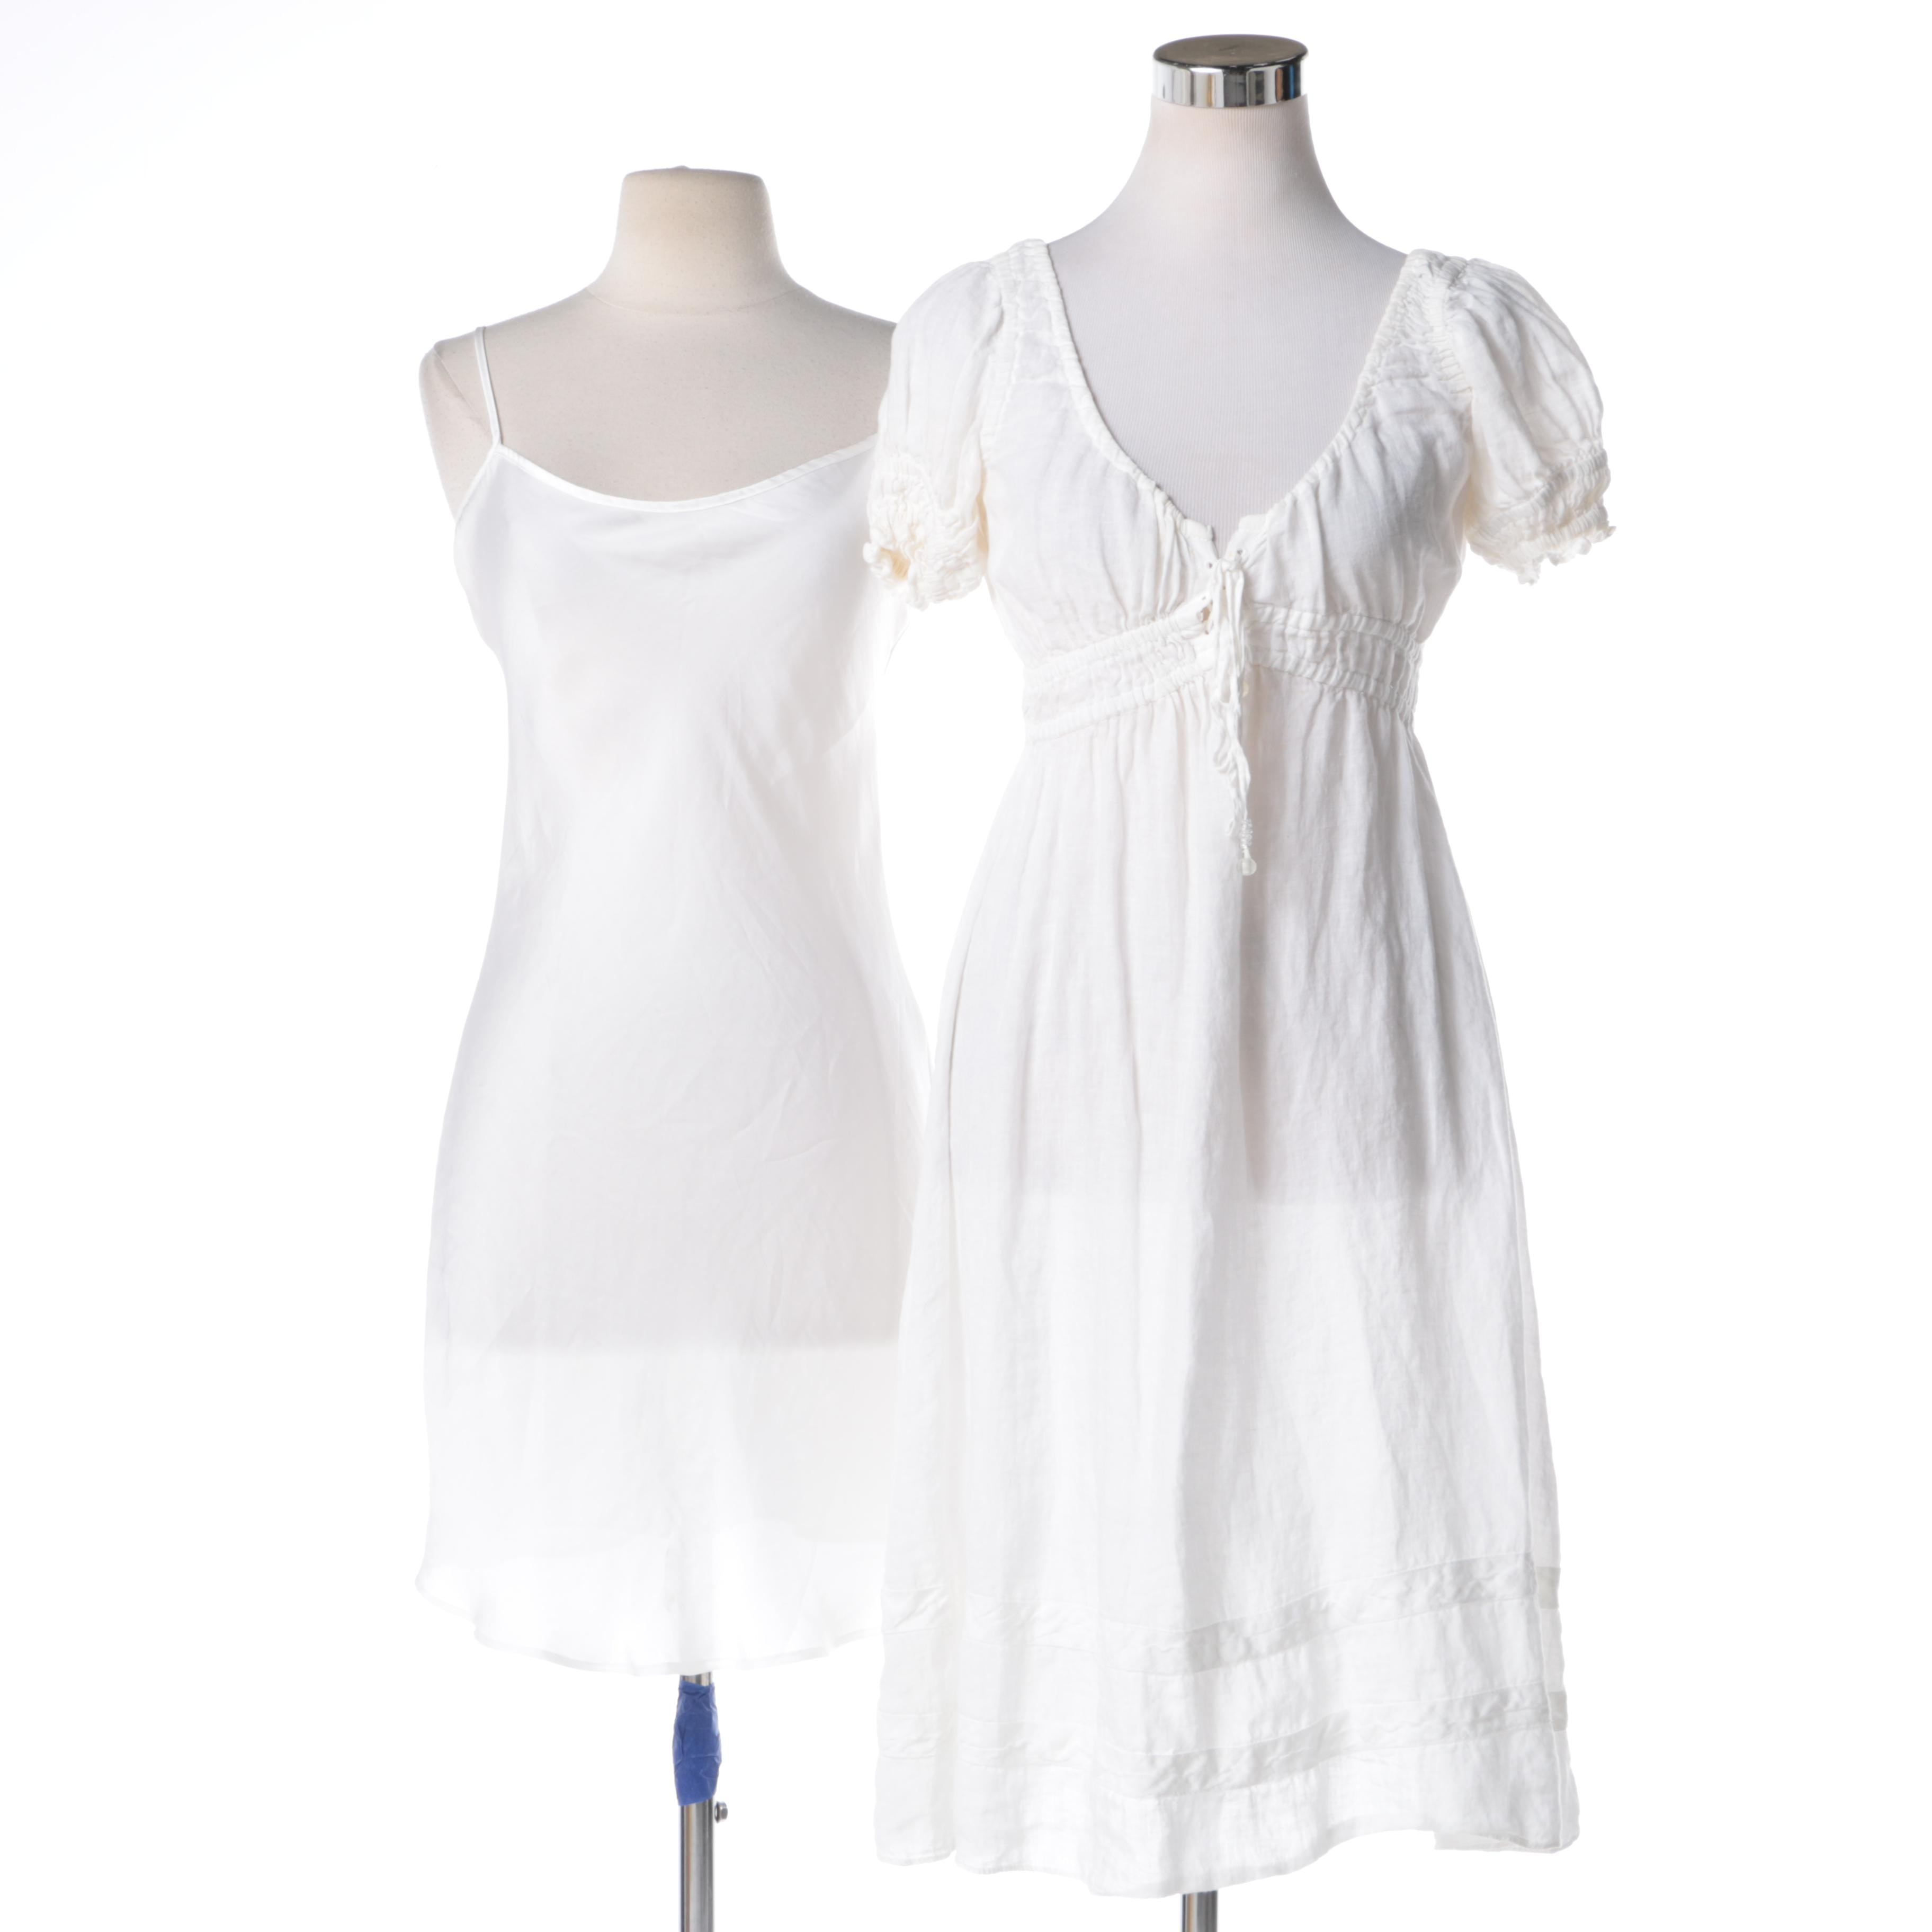 Calypso White Linen Dress and Slip Dress